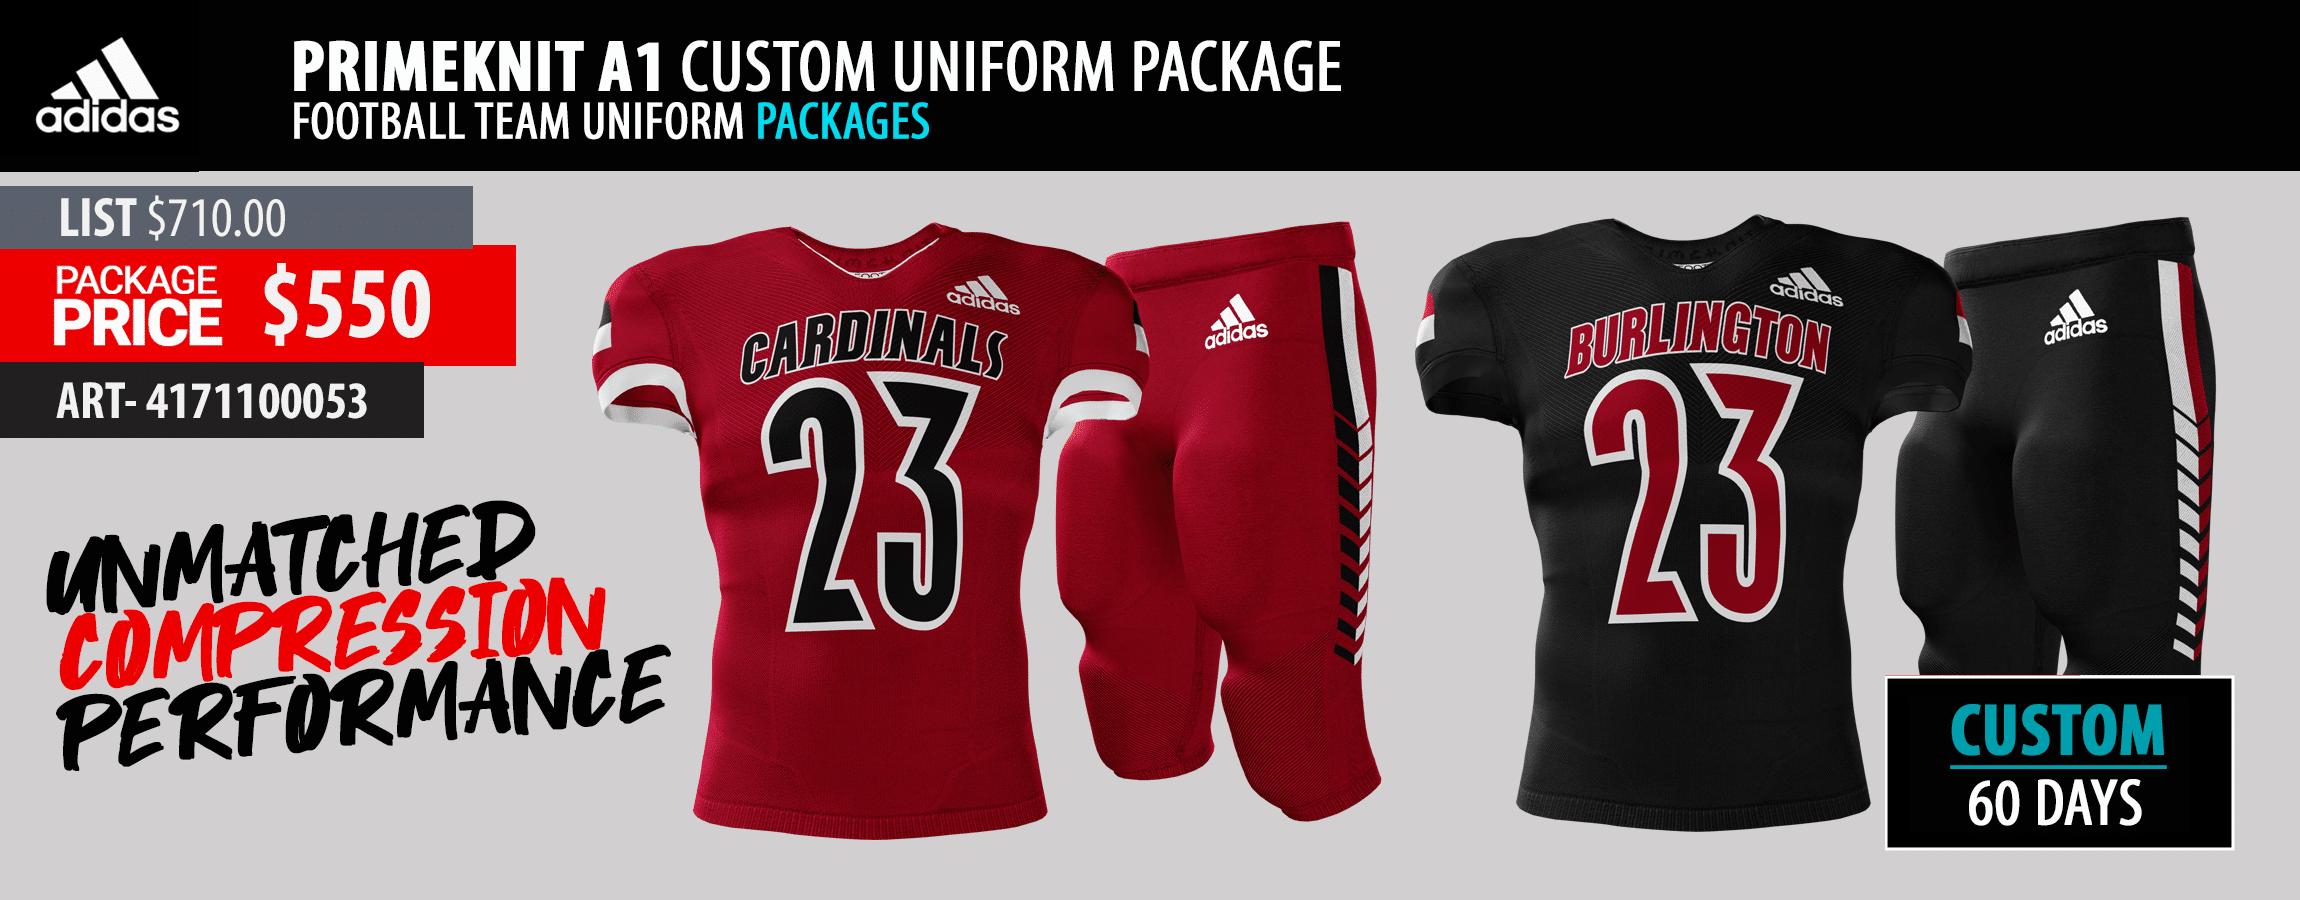 Rawlings Reversible Custom Football Uniform Package - Custom Jersey and Integrated Pant